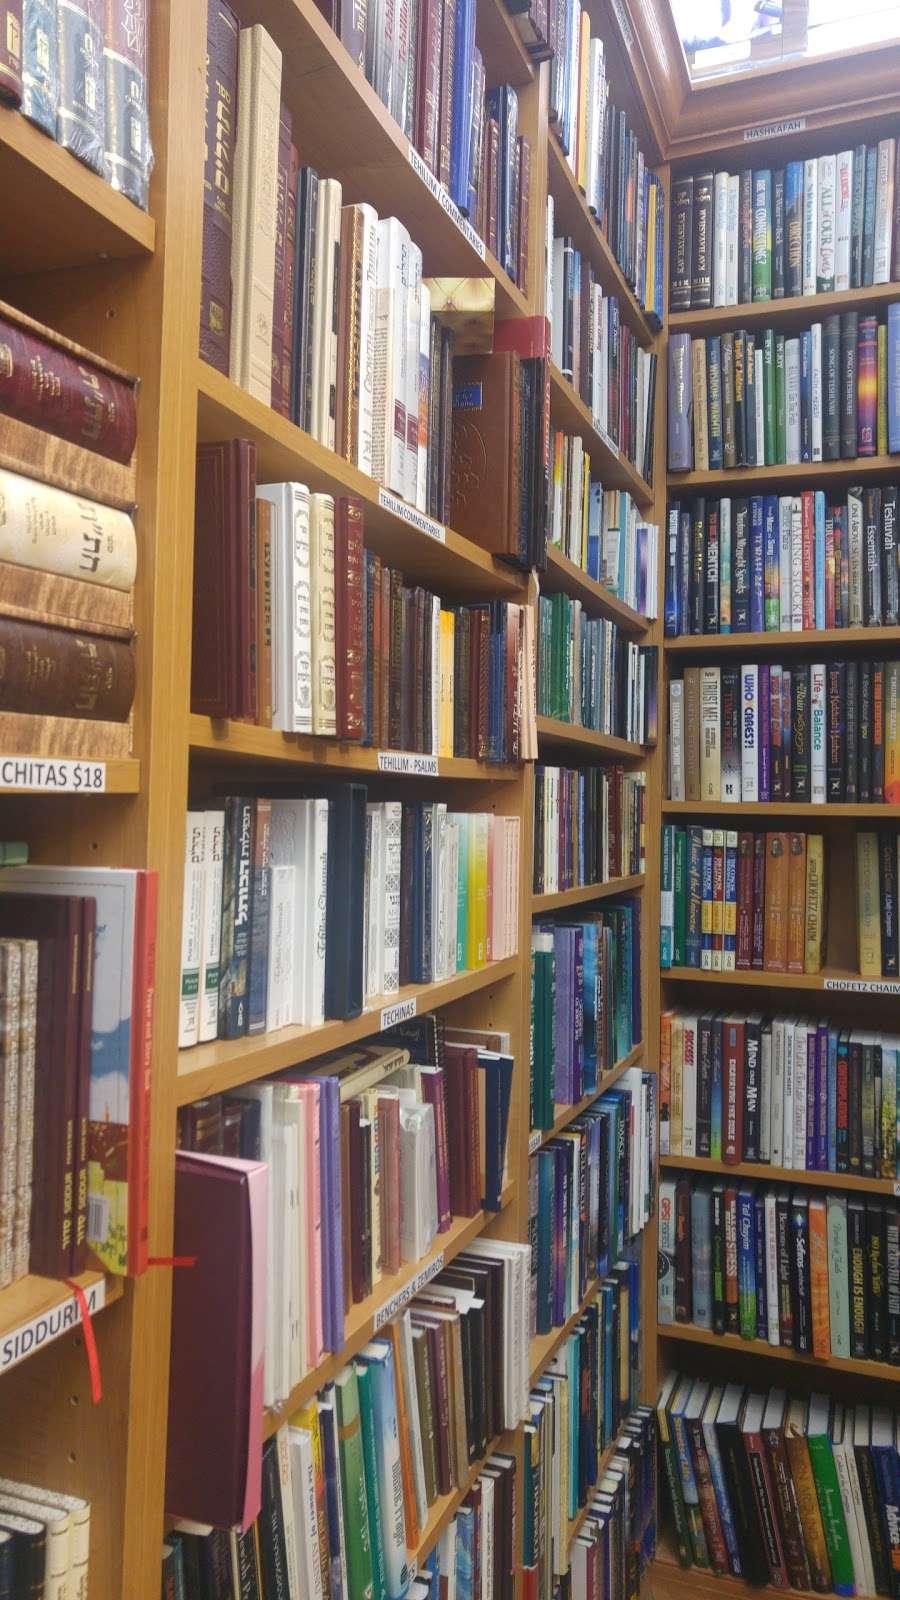 Judaica World - store  | Photo 6 of 10 | Address: 329 Kingston Ave, Brooklyn, NY 11213, USA | Phone: (718) 604-1020